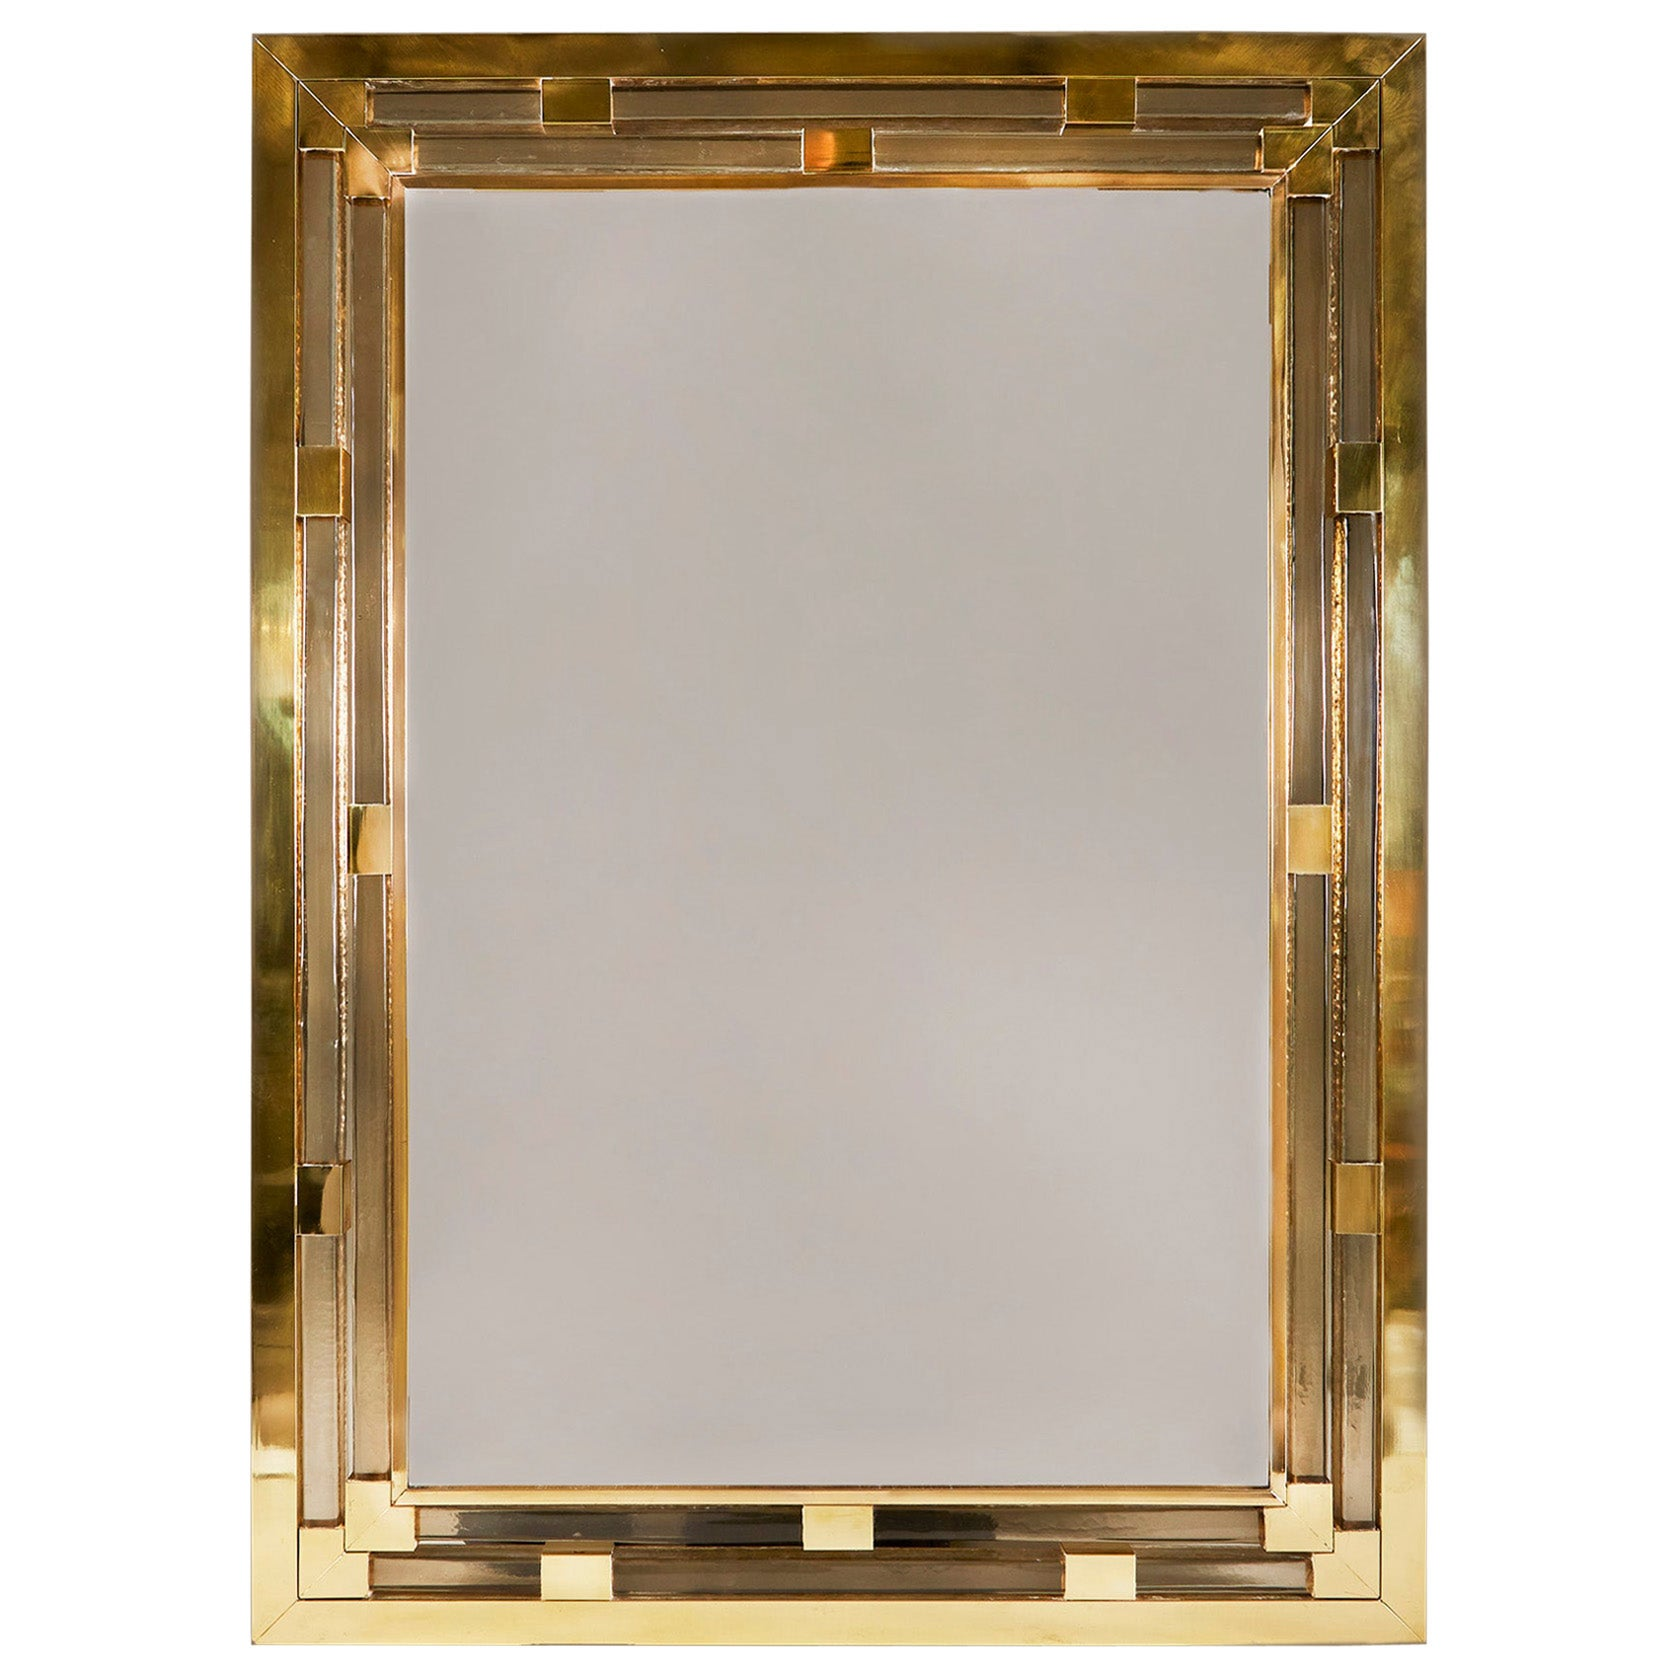 Contemporary Brass and Murano Glass Wall Mirror